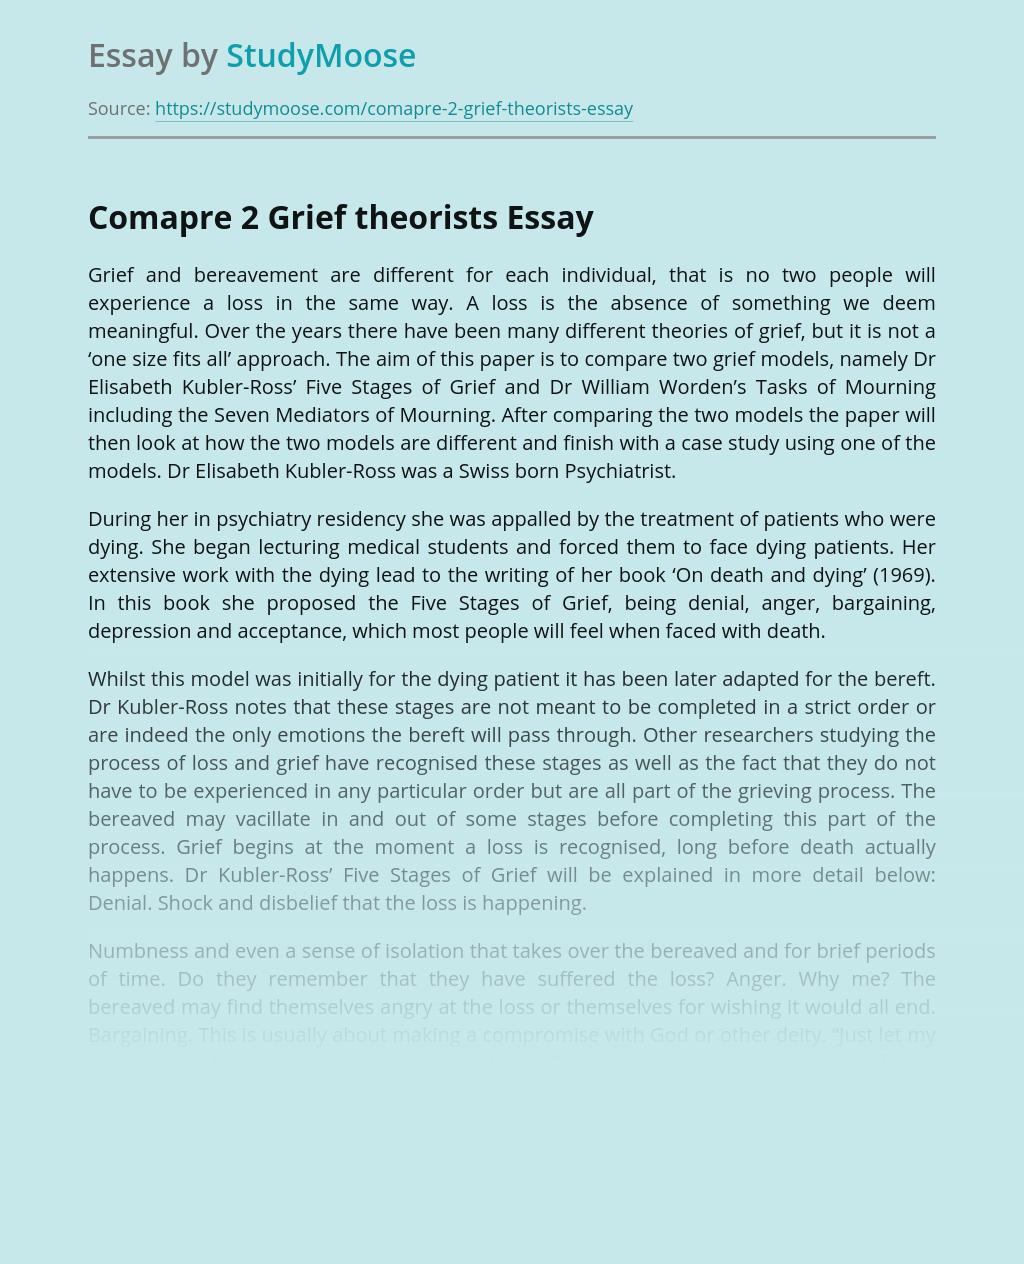 Comapre 2 Grief theorists